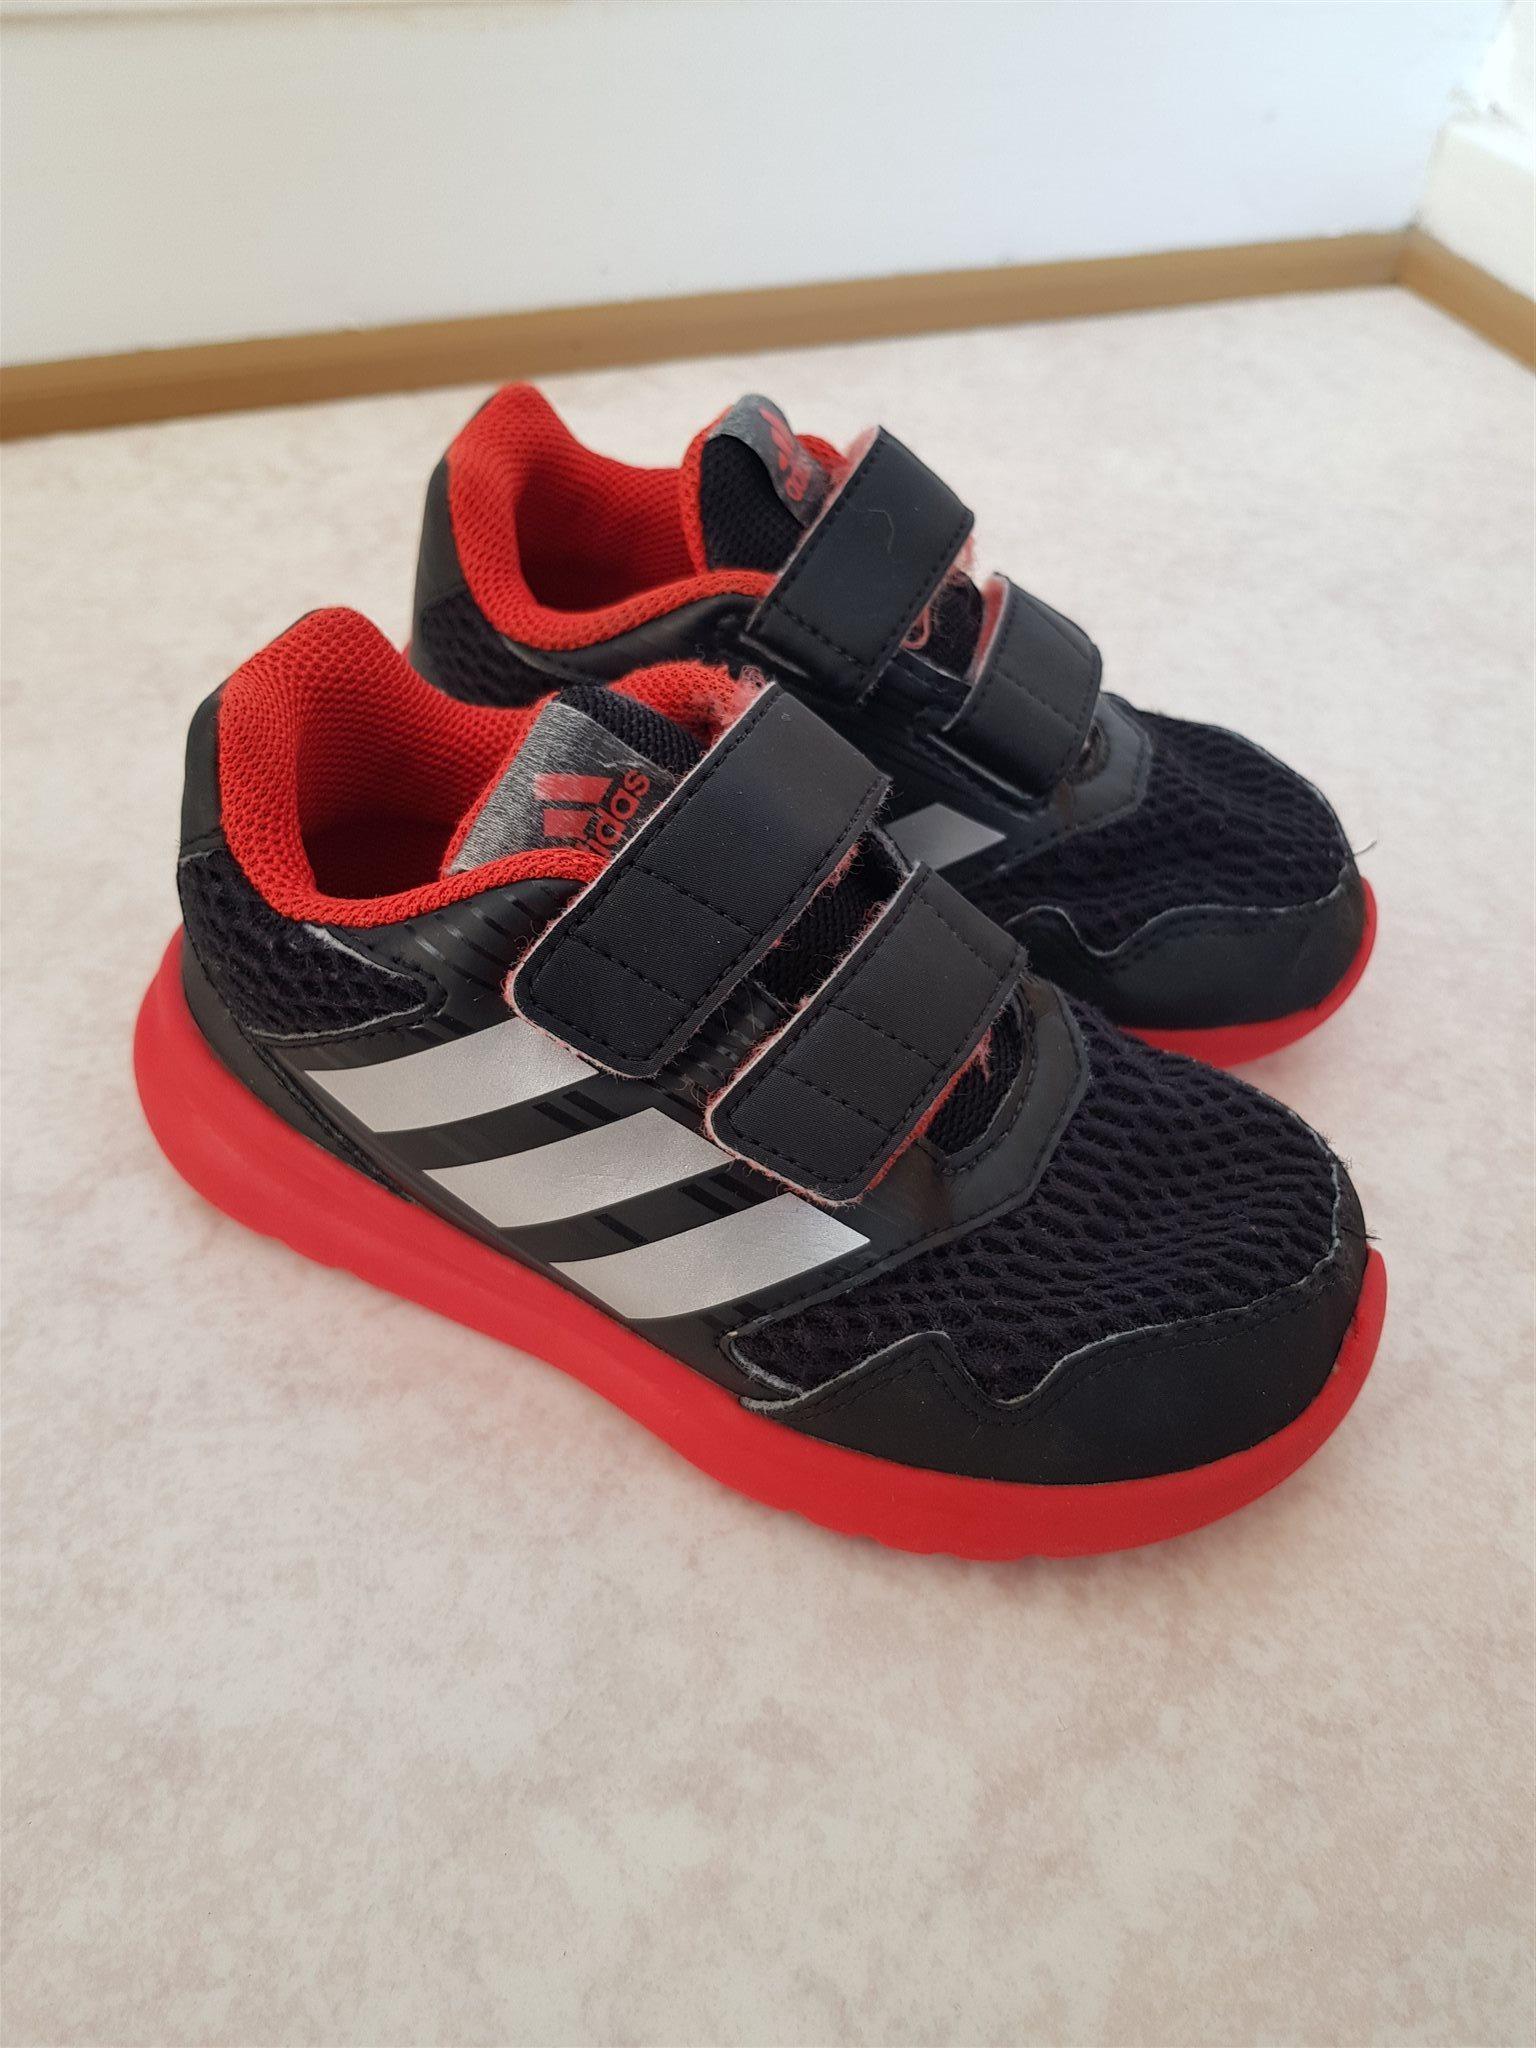 reputable site 9b140 cf401 röda svarta sneakers strl skor amp  26 ADIDAS 320611297 HZAdwxH